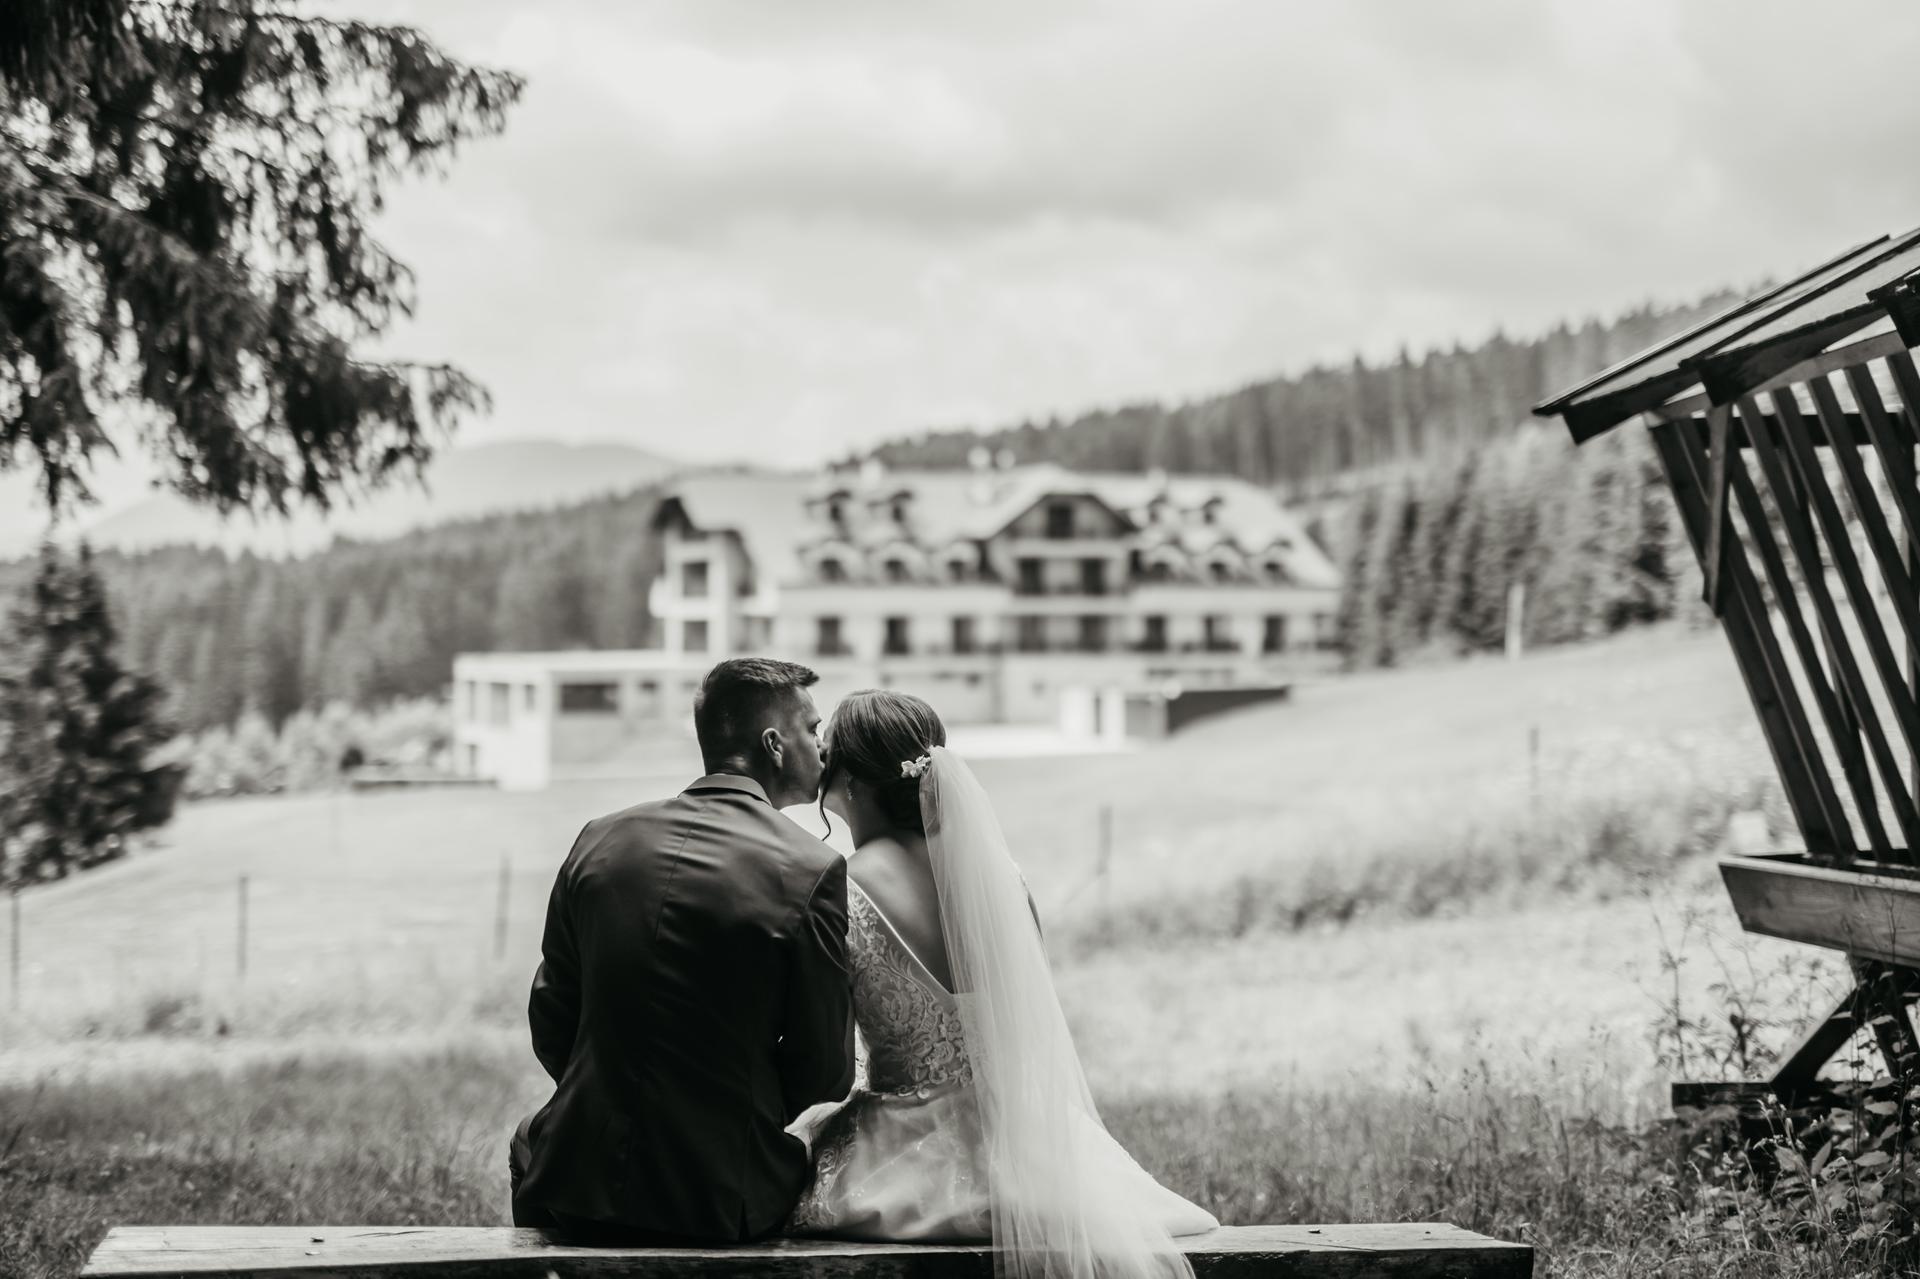 Our wedding ❤️ - Obrázok č. 6